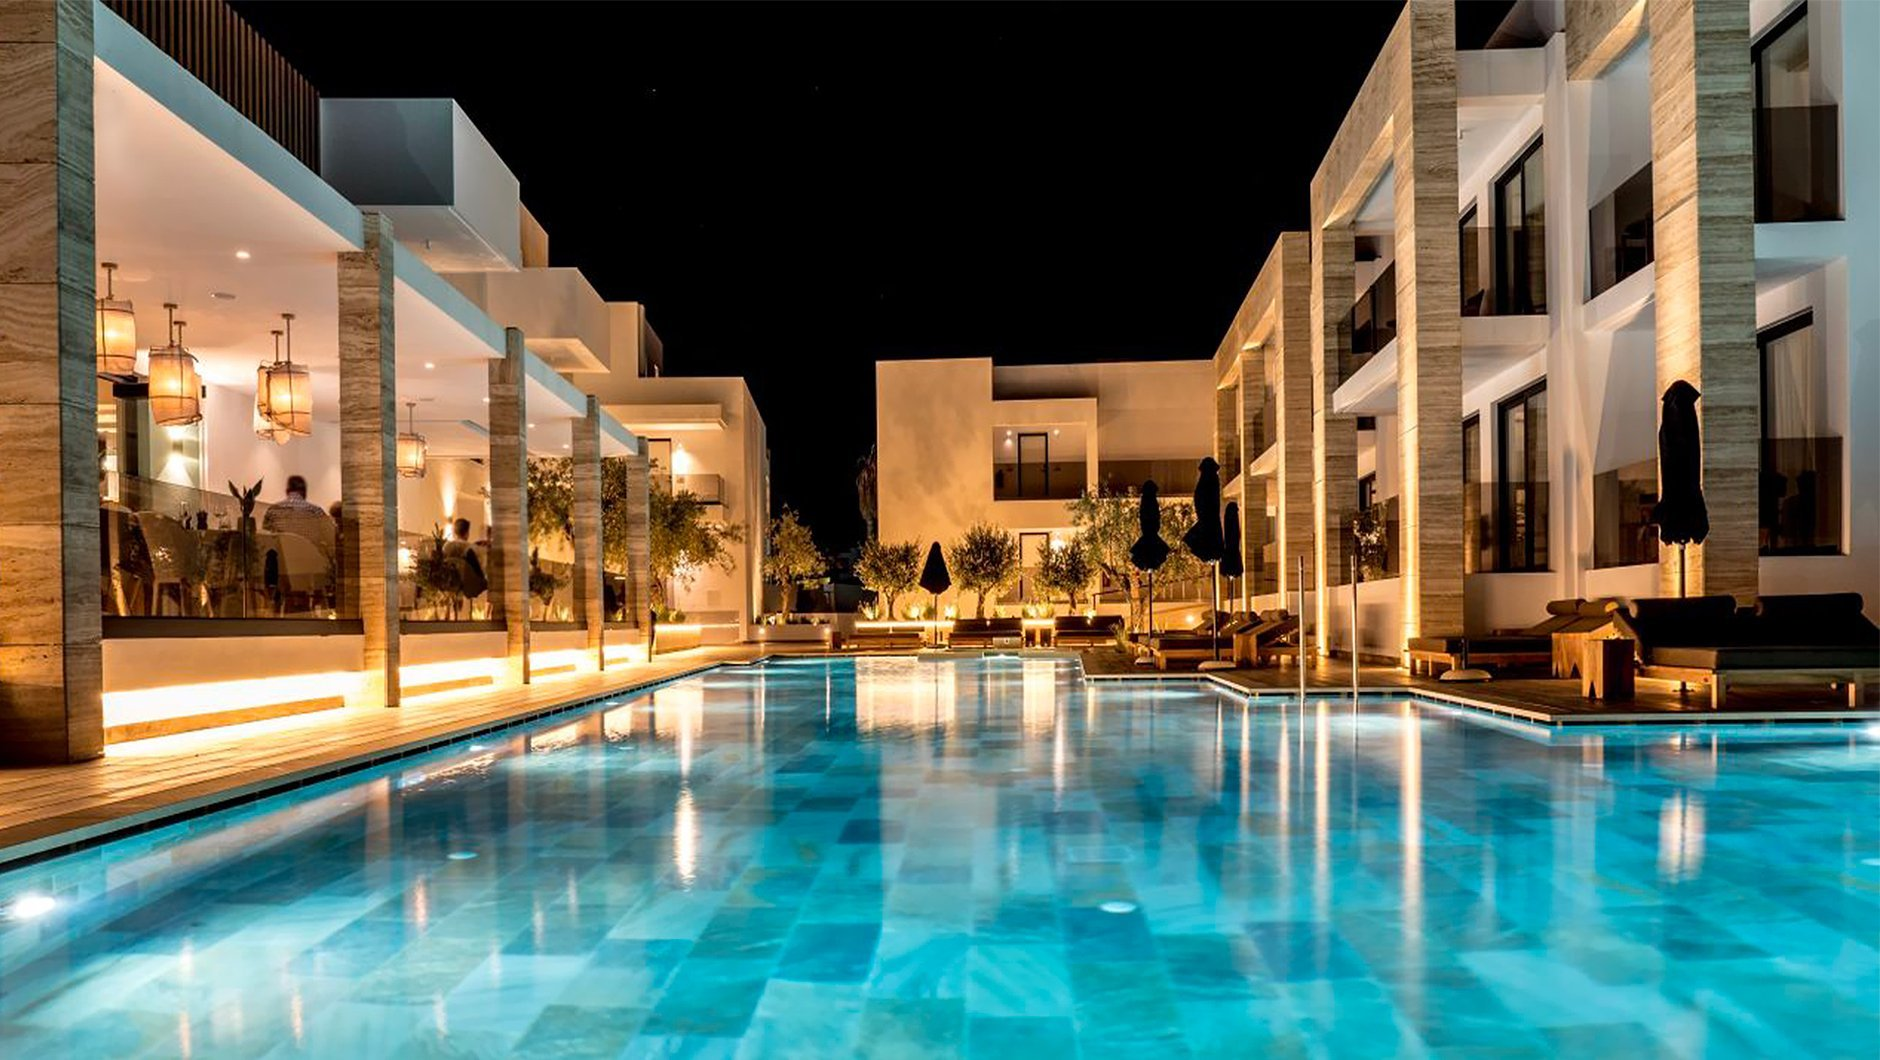 Lango Hotel Kos